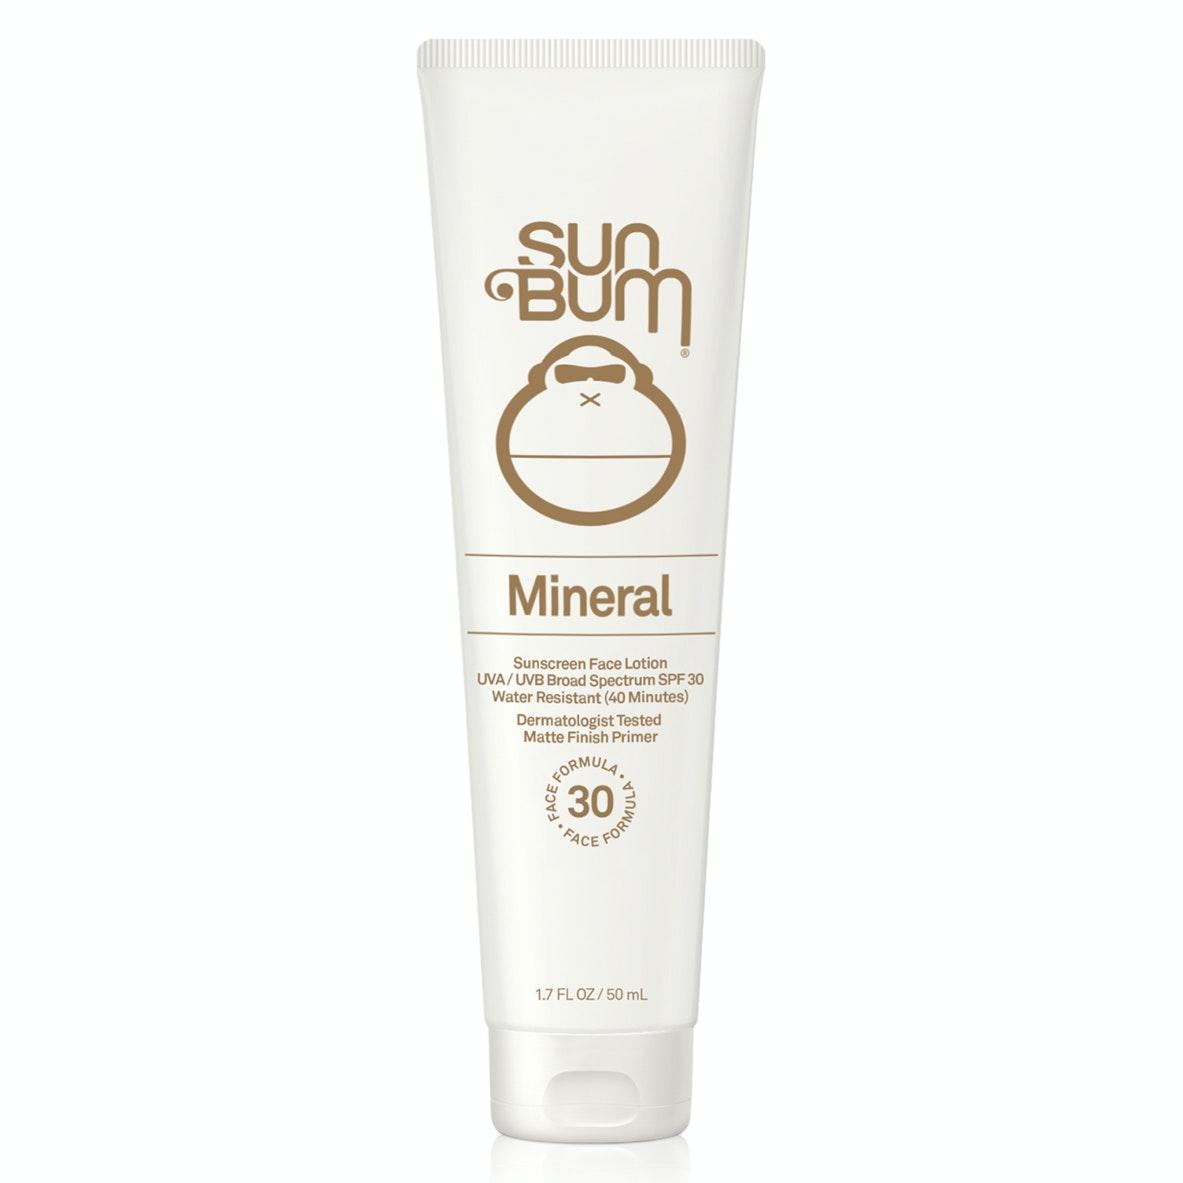 Sun Bum® Mineral SPF 30 Sunscreen Face Lotion